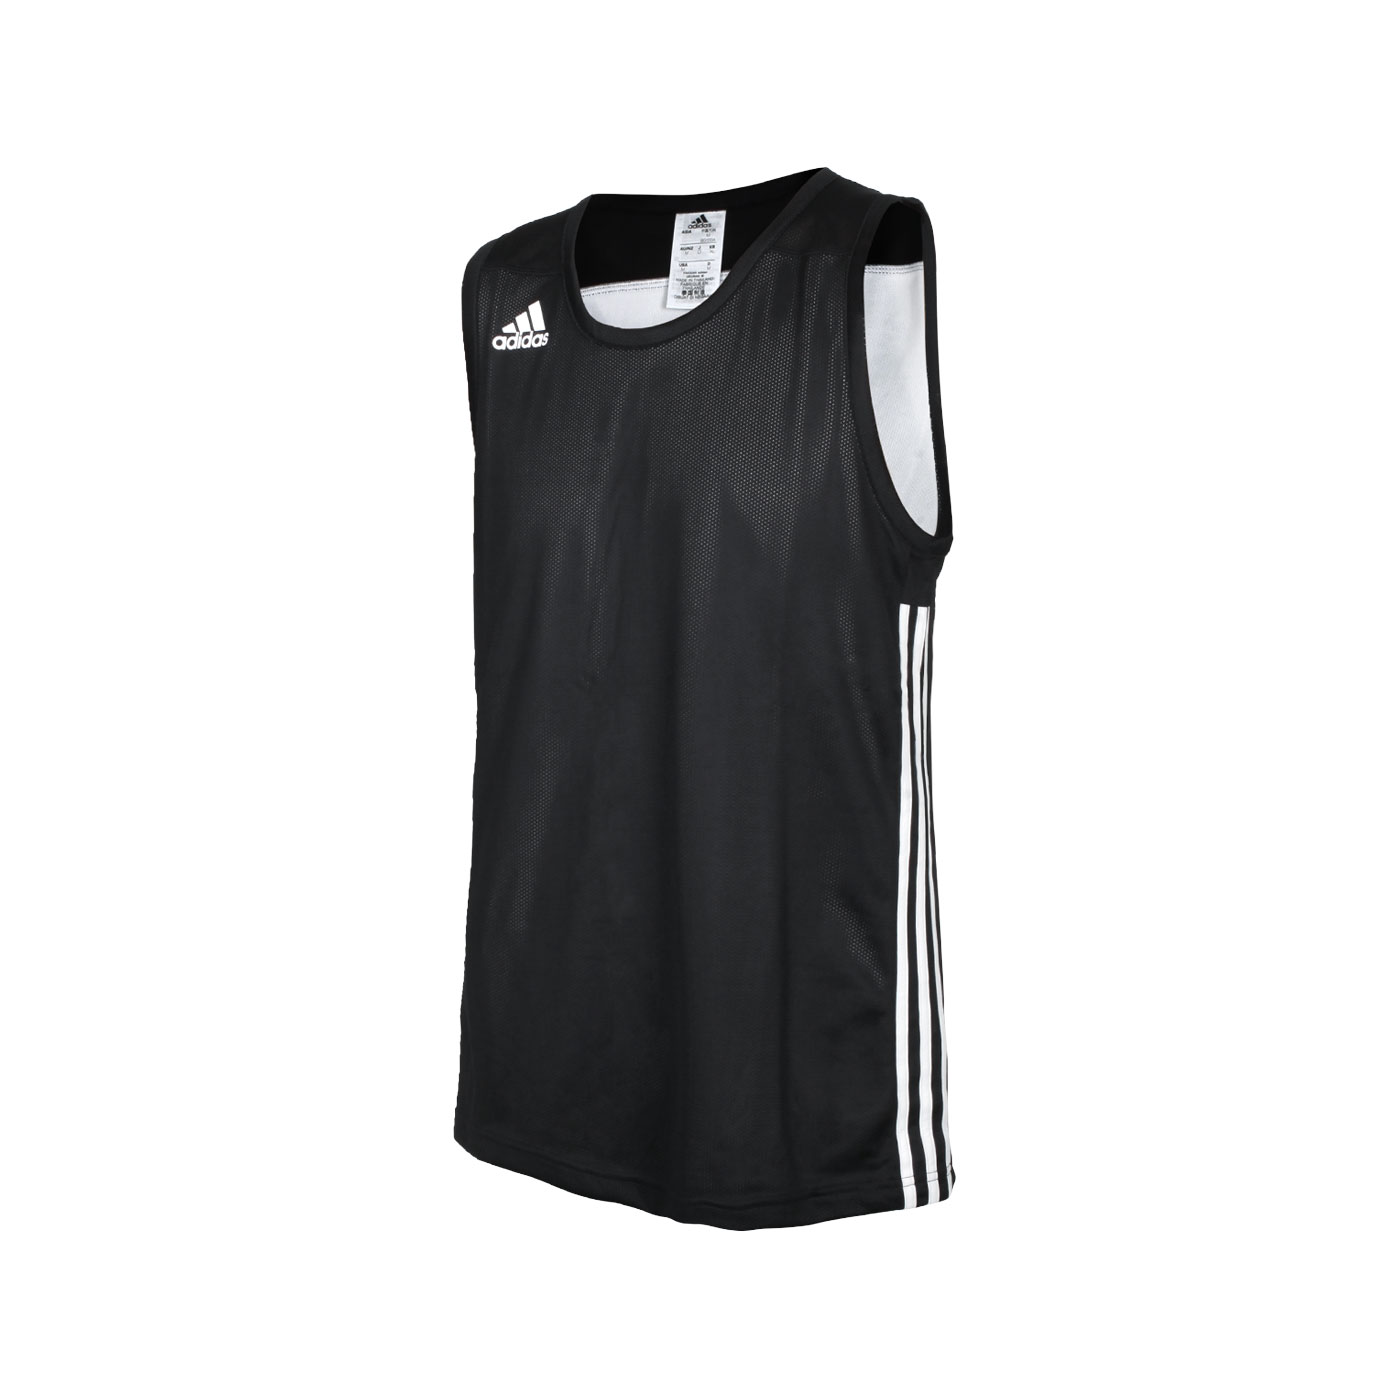 ADIDAS 男款籃球雙面運動背心 DX6385 - 黑白